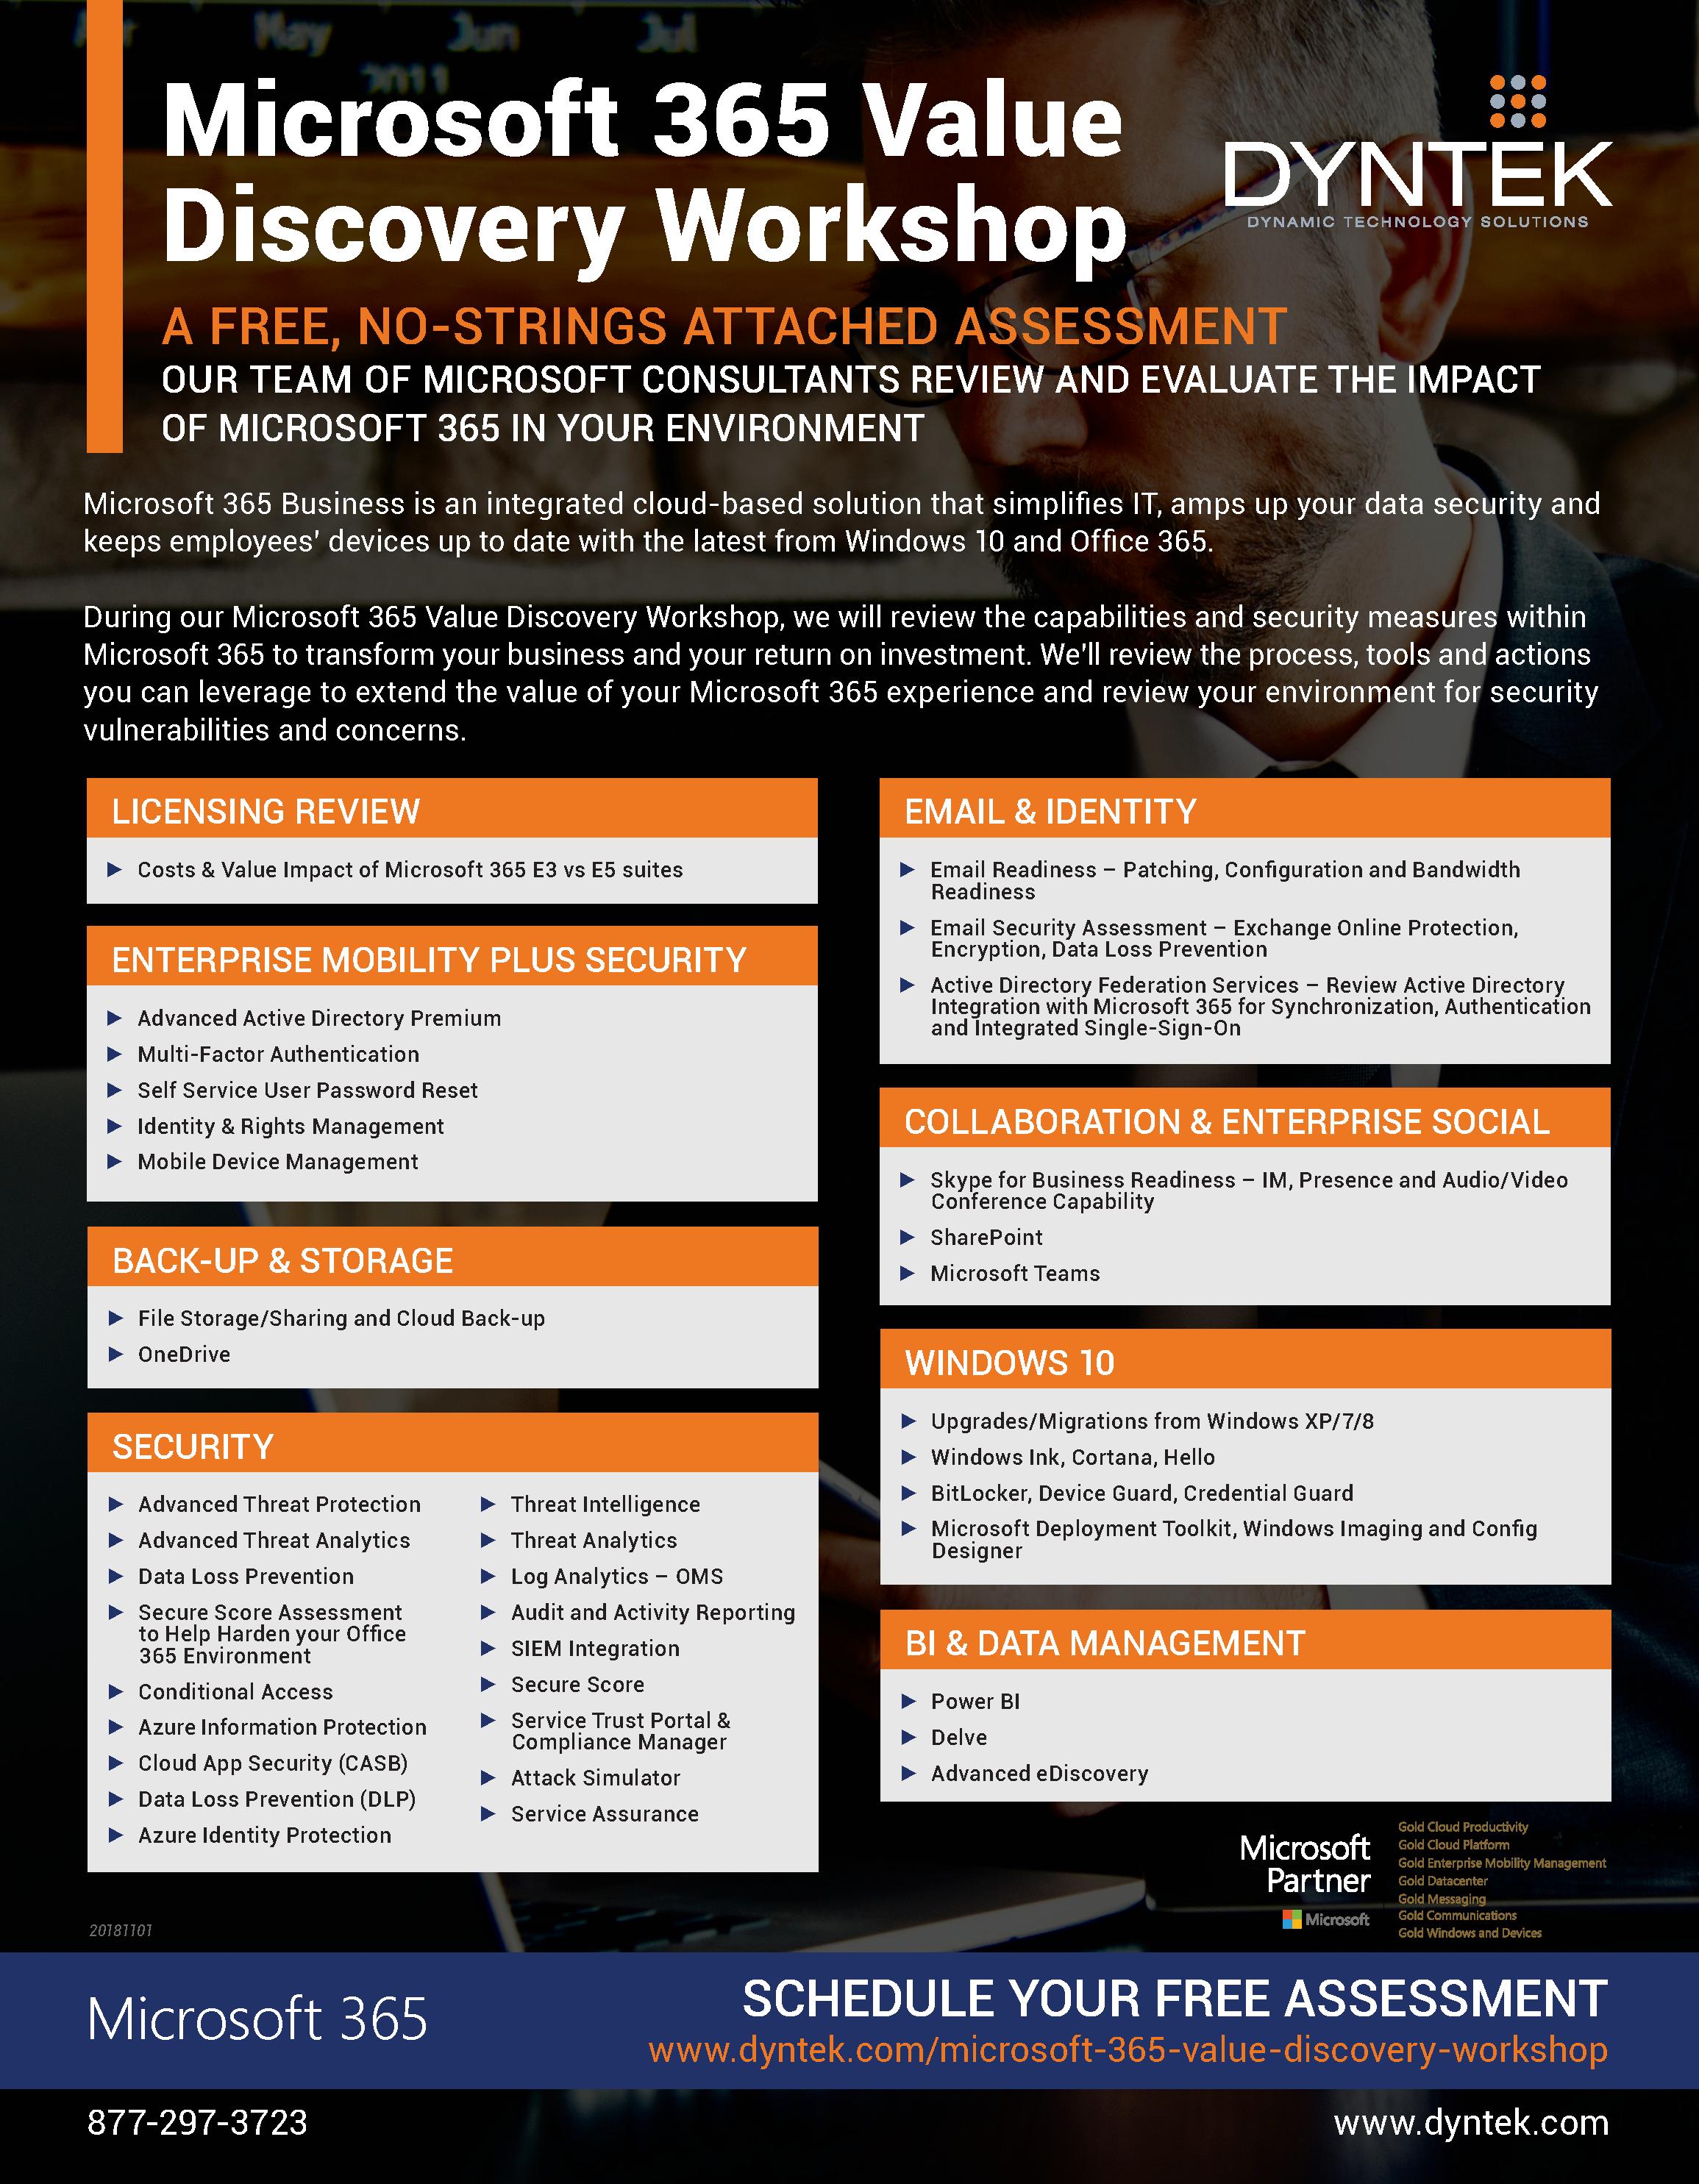 Microsoft 365 Value Discovery Workshop-print